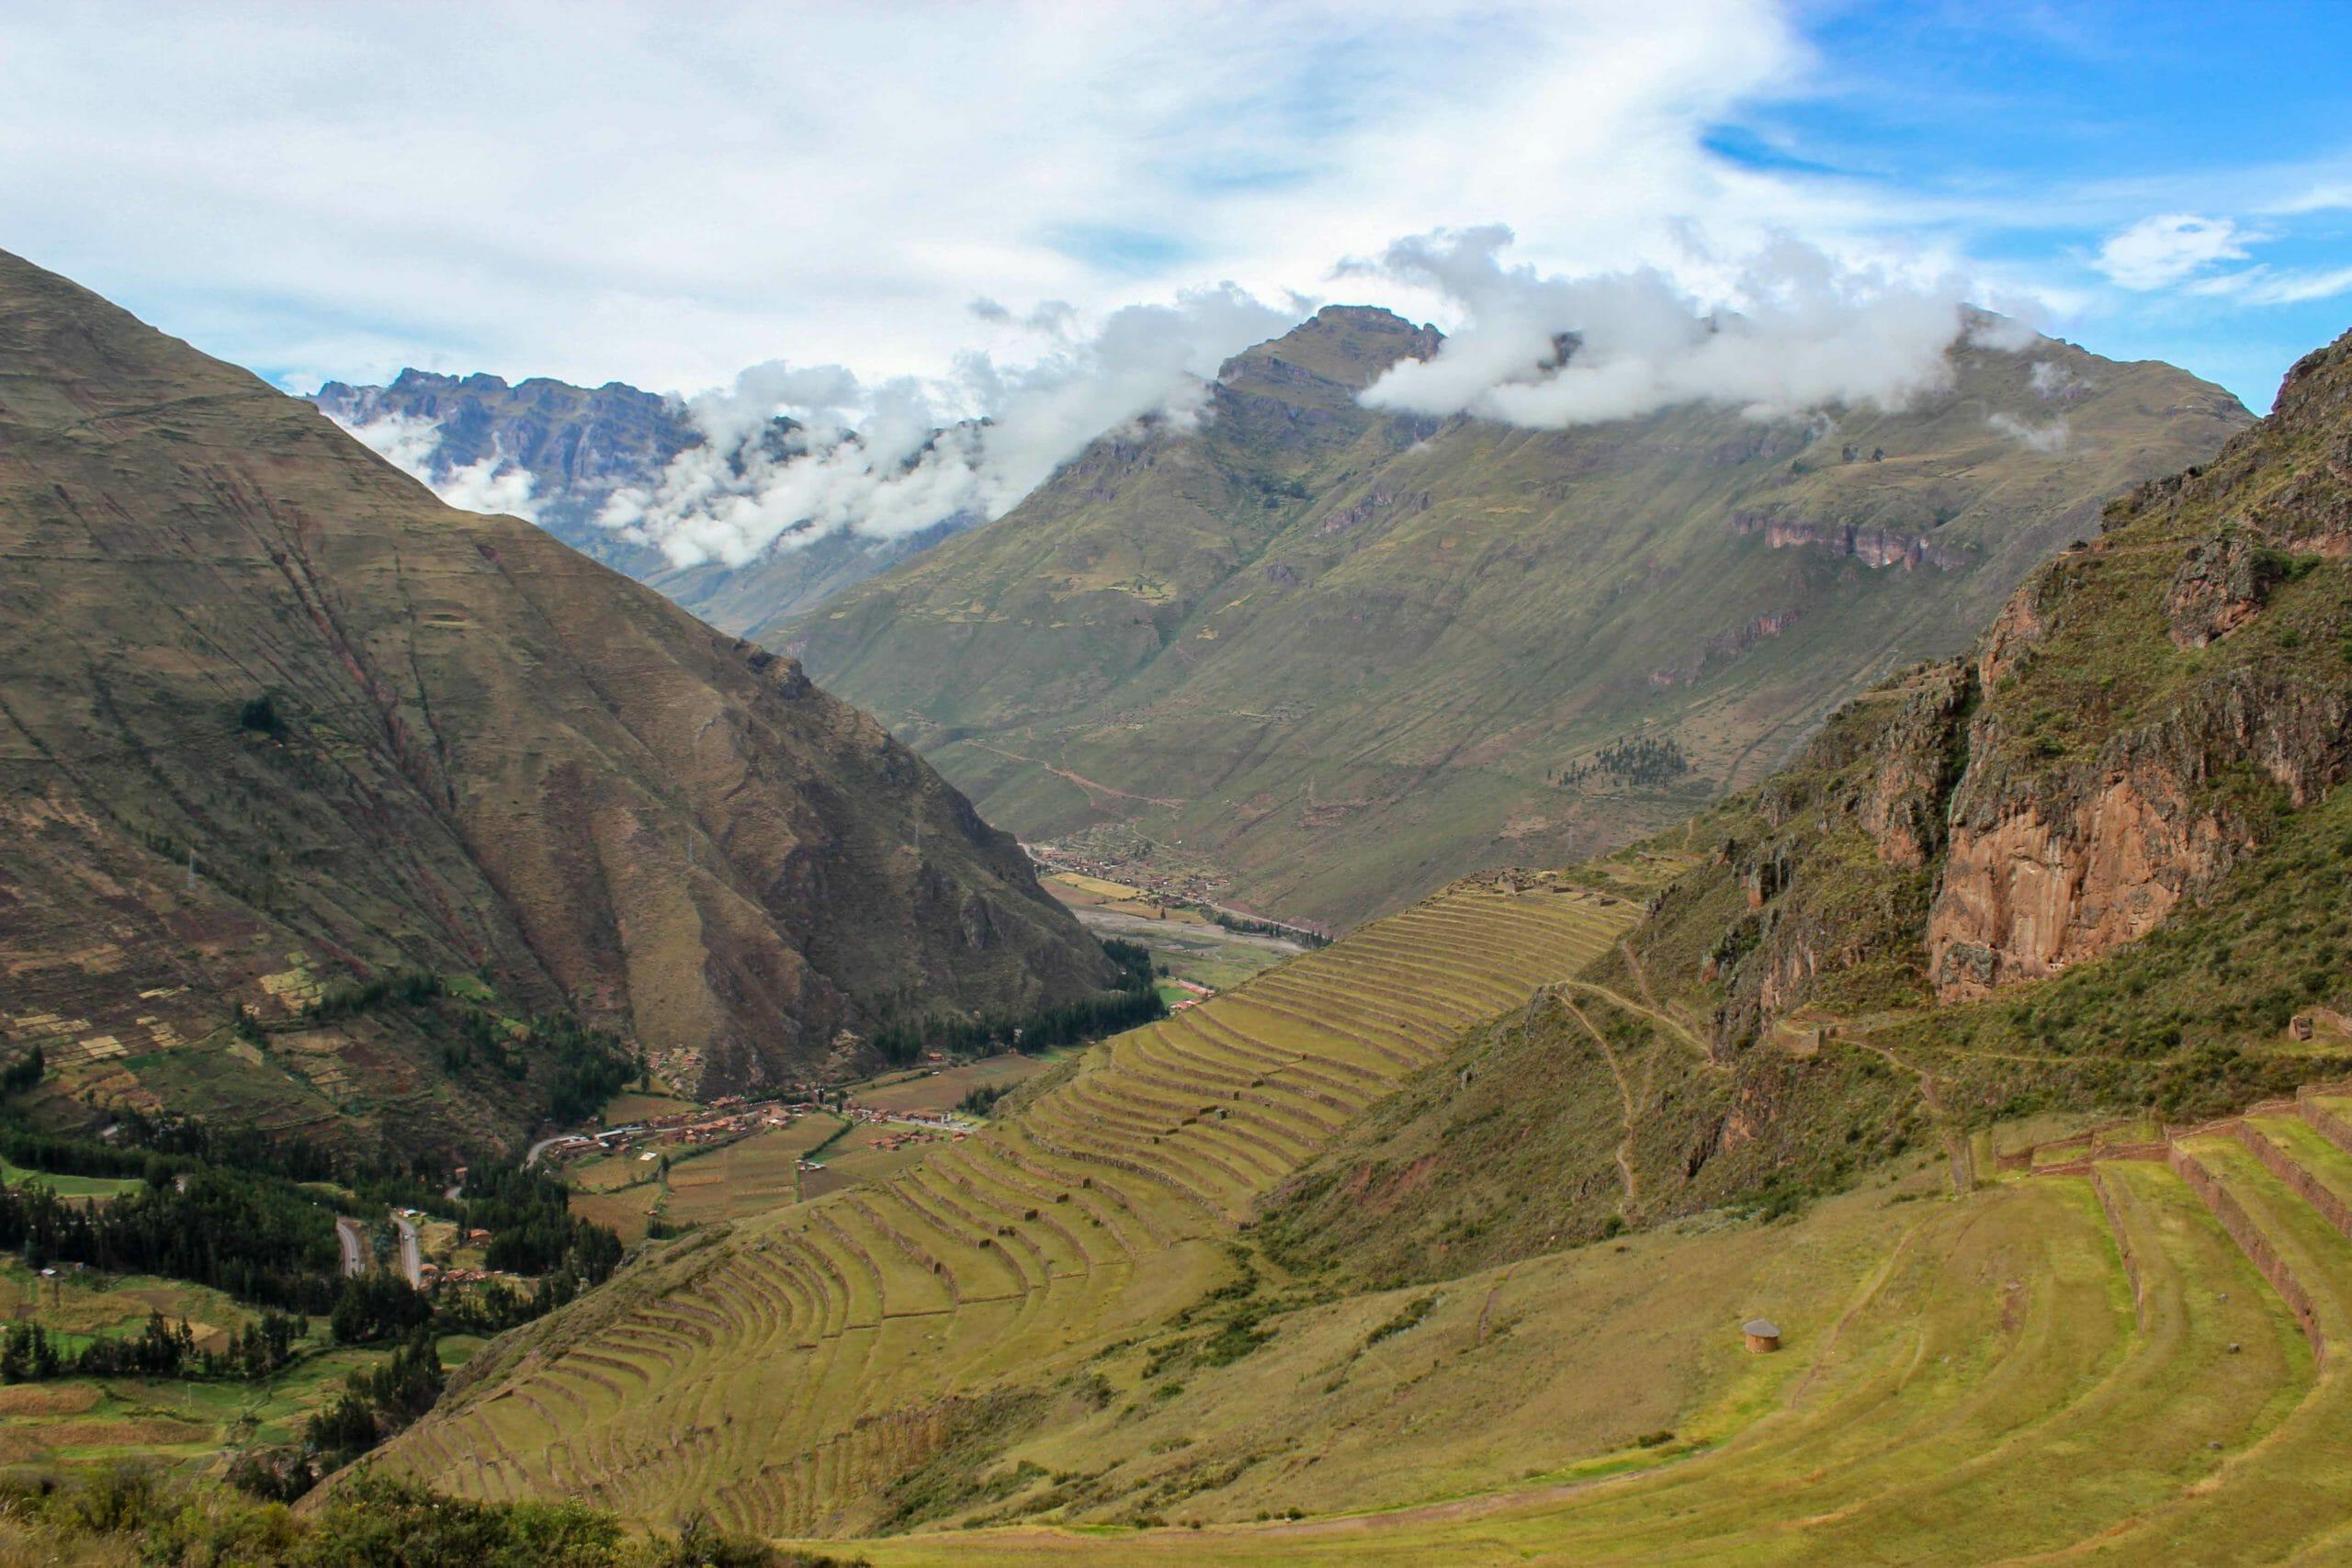 La Vallée Sacrée des Incas au Pérou : nos 5 incontournables à visiter !